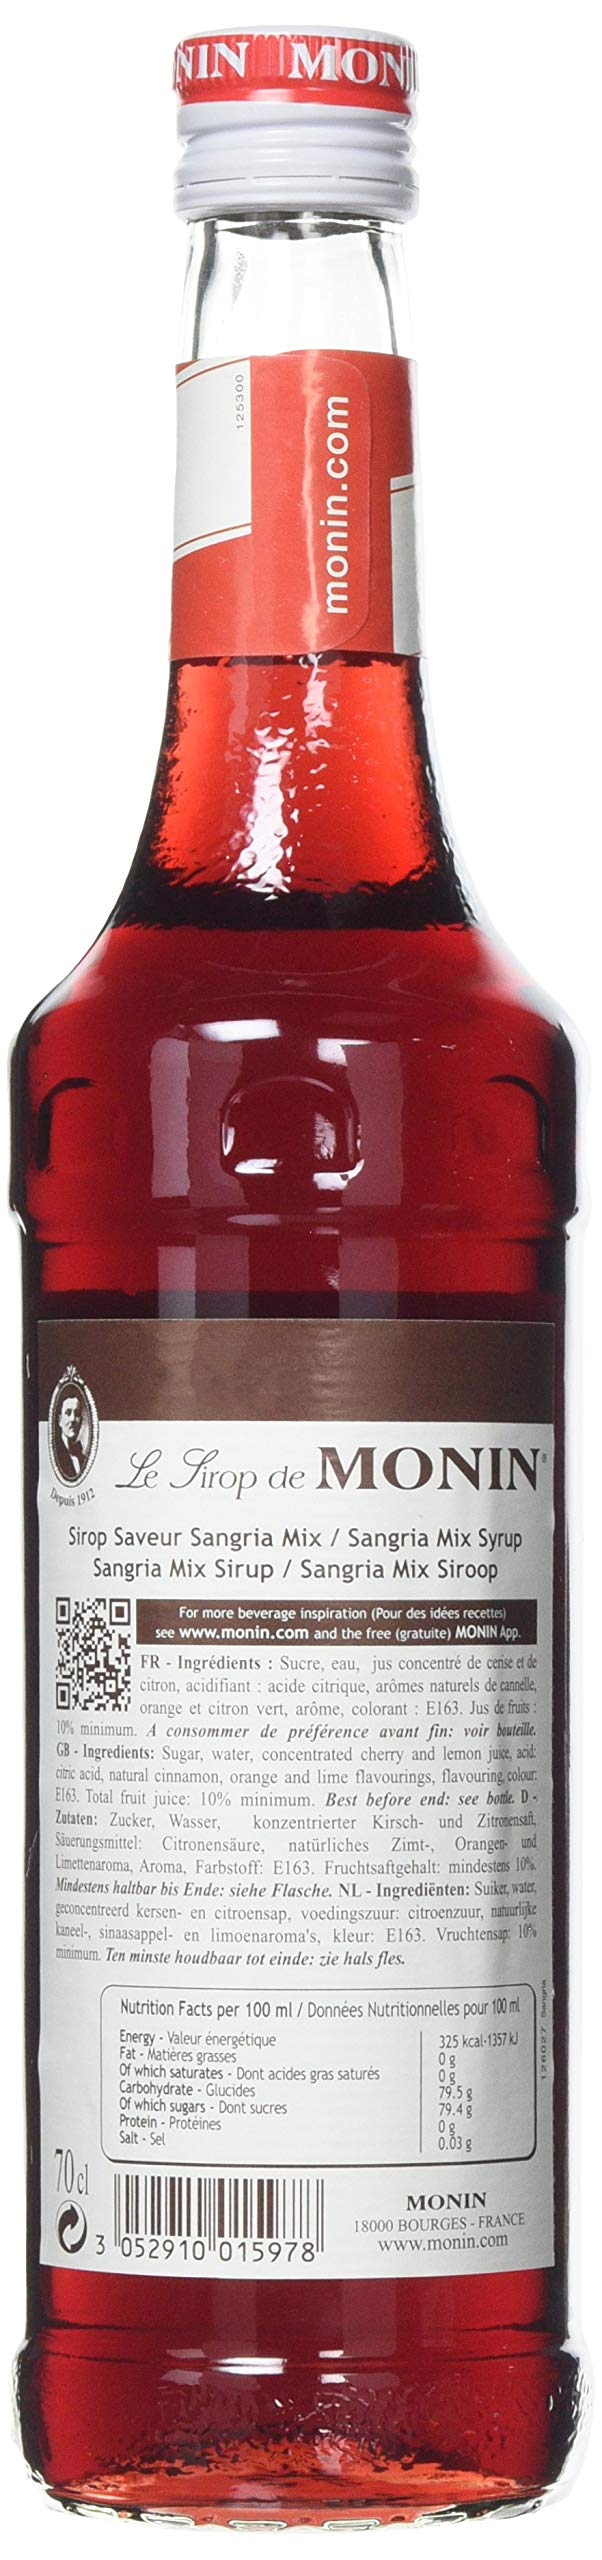 Monin-Sangria-70cl-Bottle